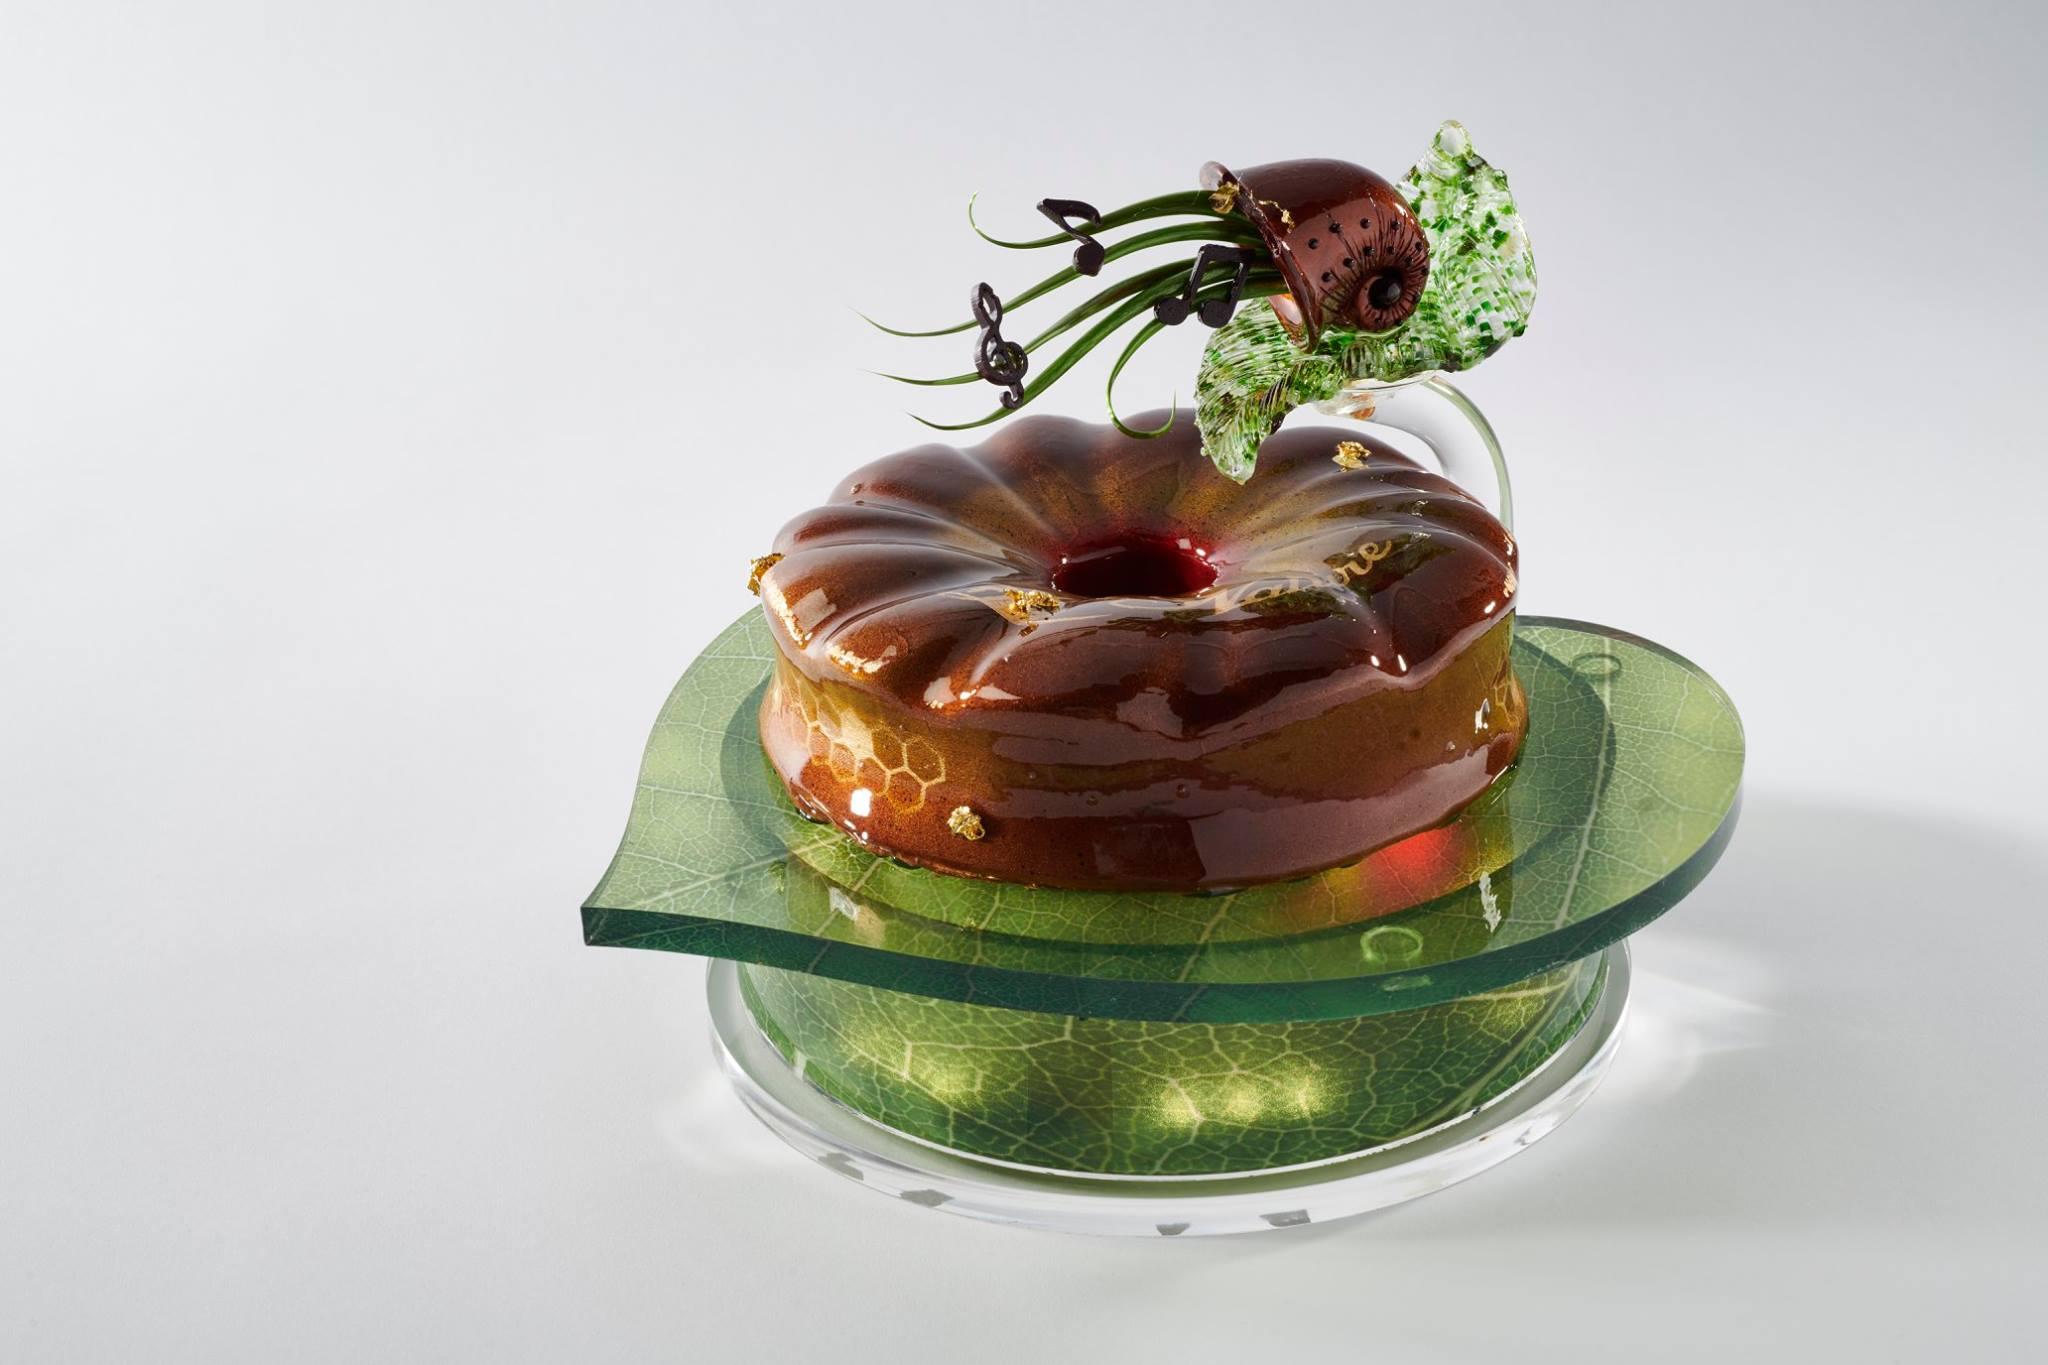 sogeres-dessert-malaisie-SIRHA